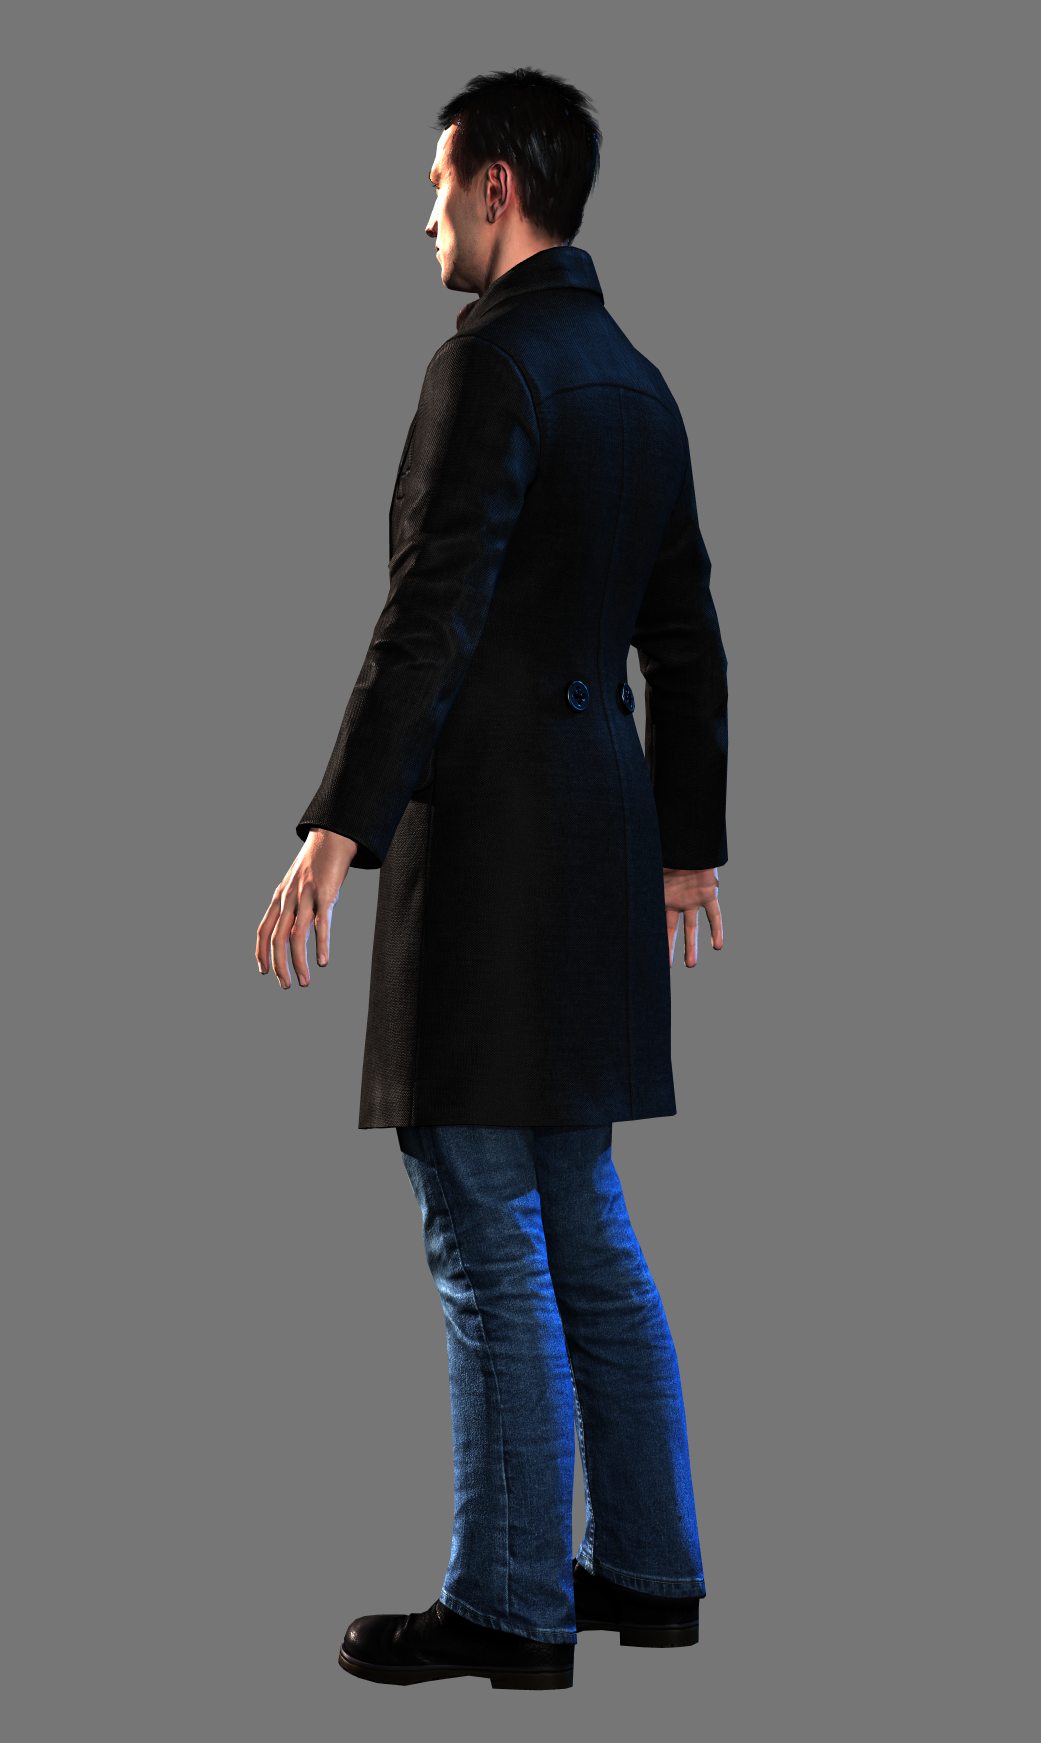 main character sh 080